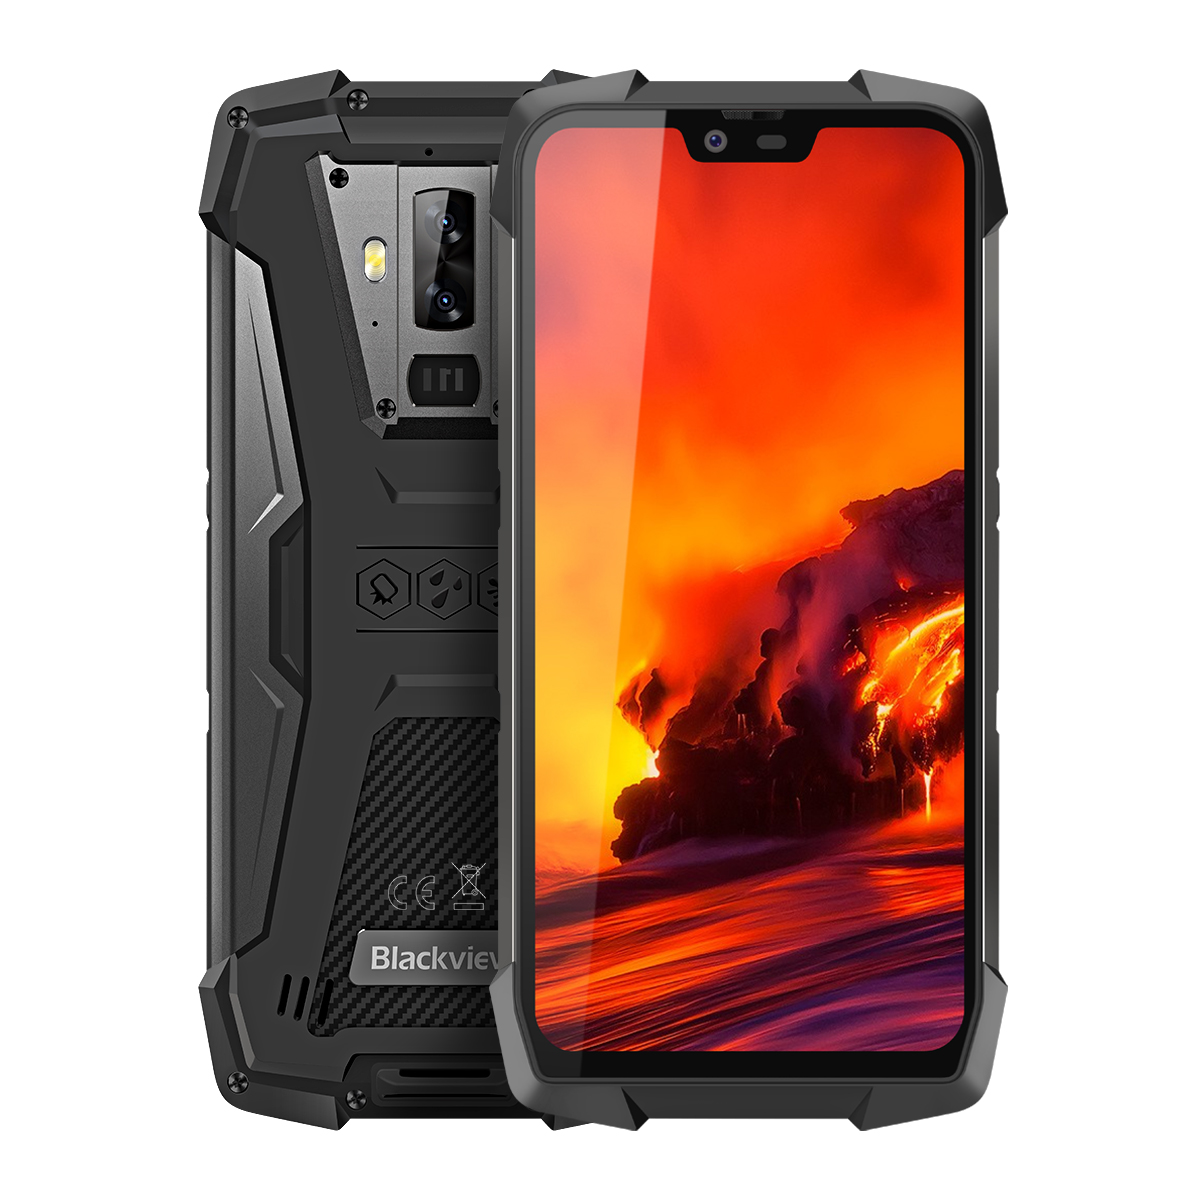 Téléphone portable robuste Blackview BV9700 Pro IP68/IP69K Helio P70 Octa core 6GB + 128GB 5.84